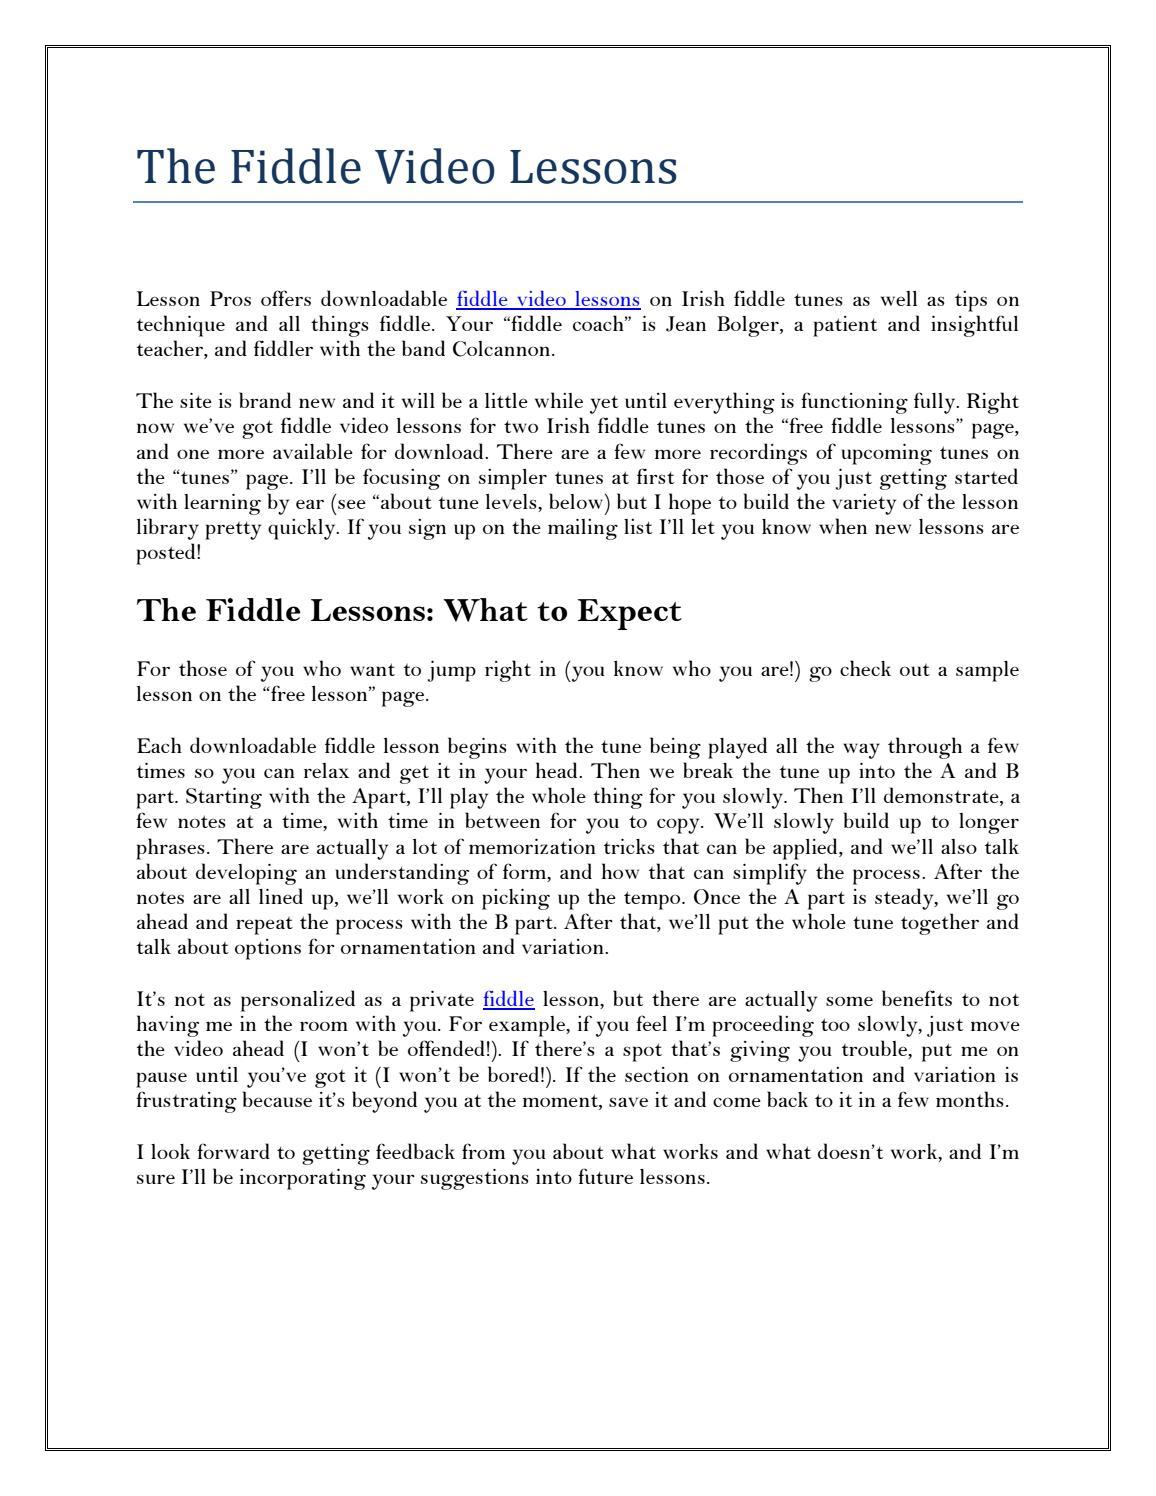 Irish Fiddle Lesson The M – Meta Morphoz